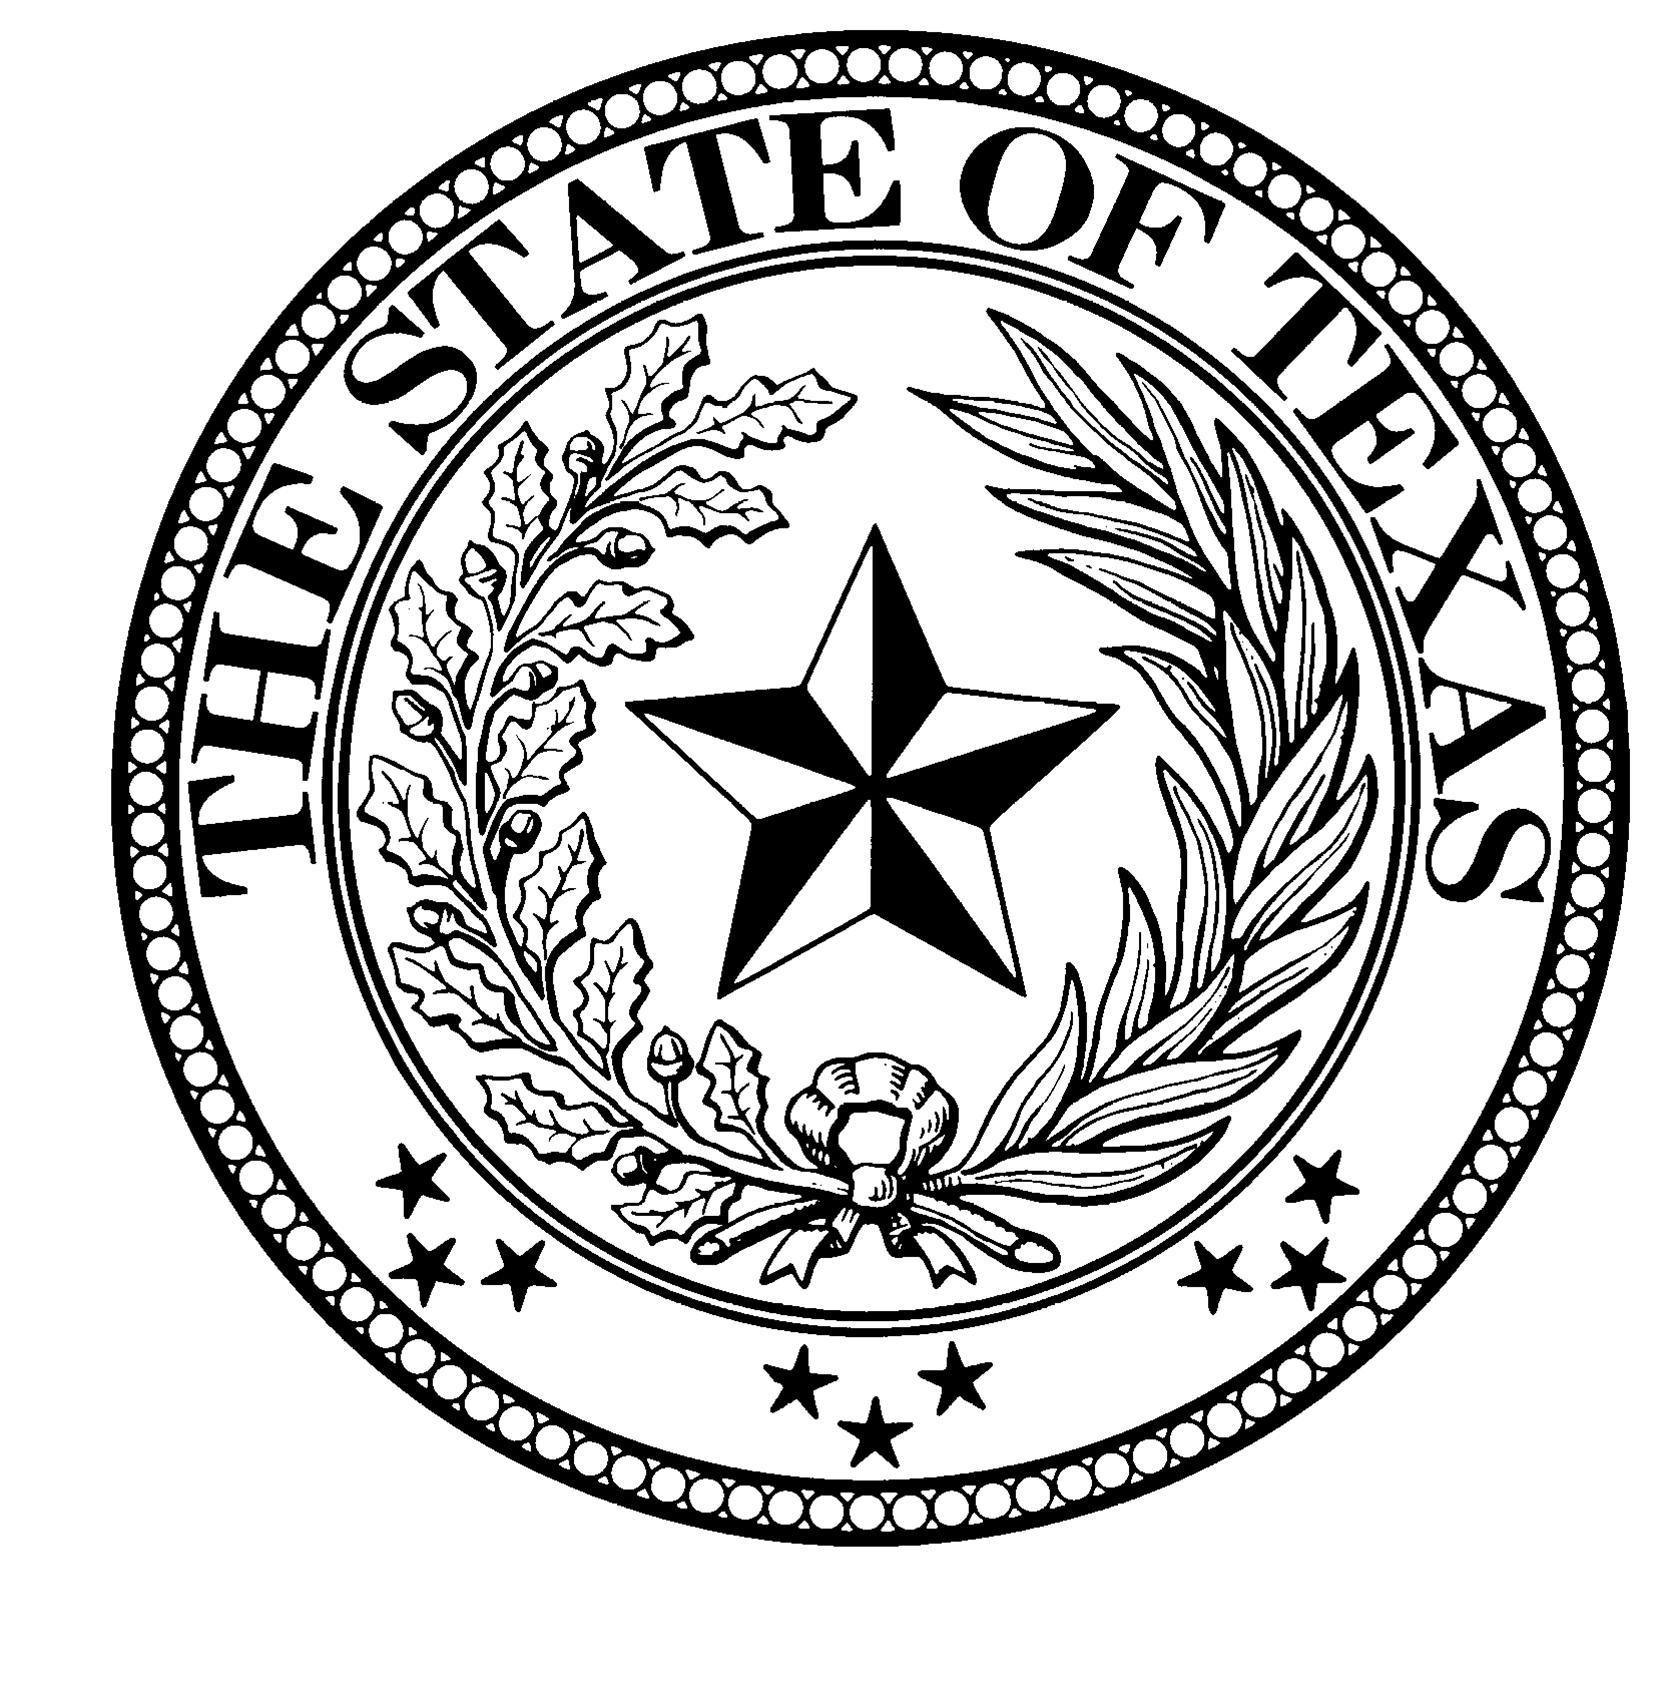 1667x1692 State